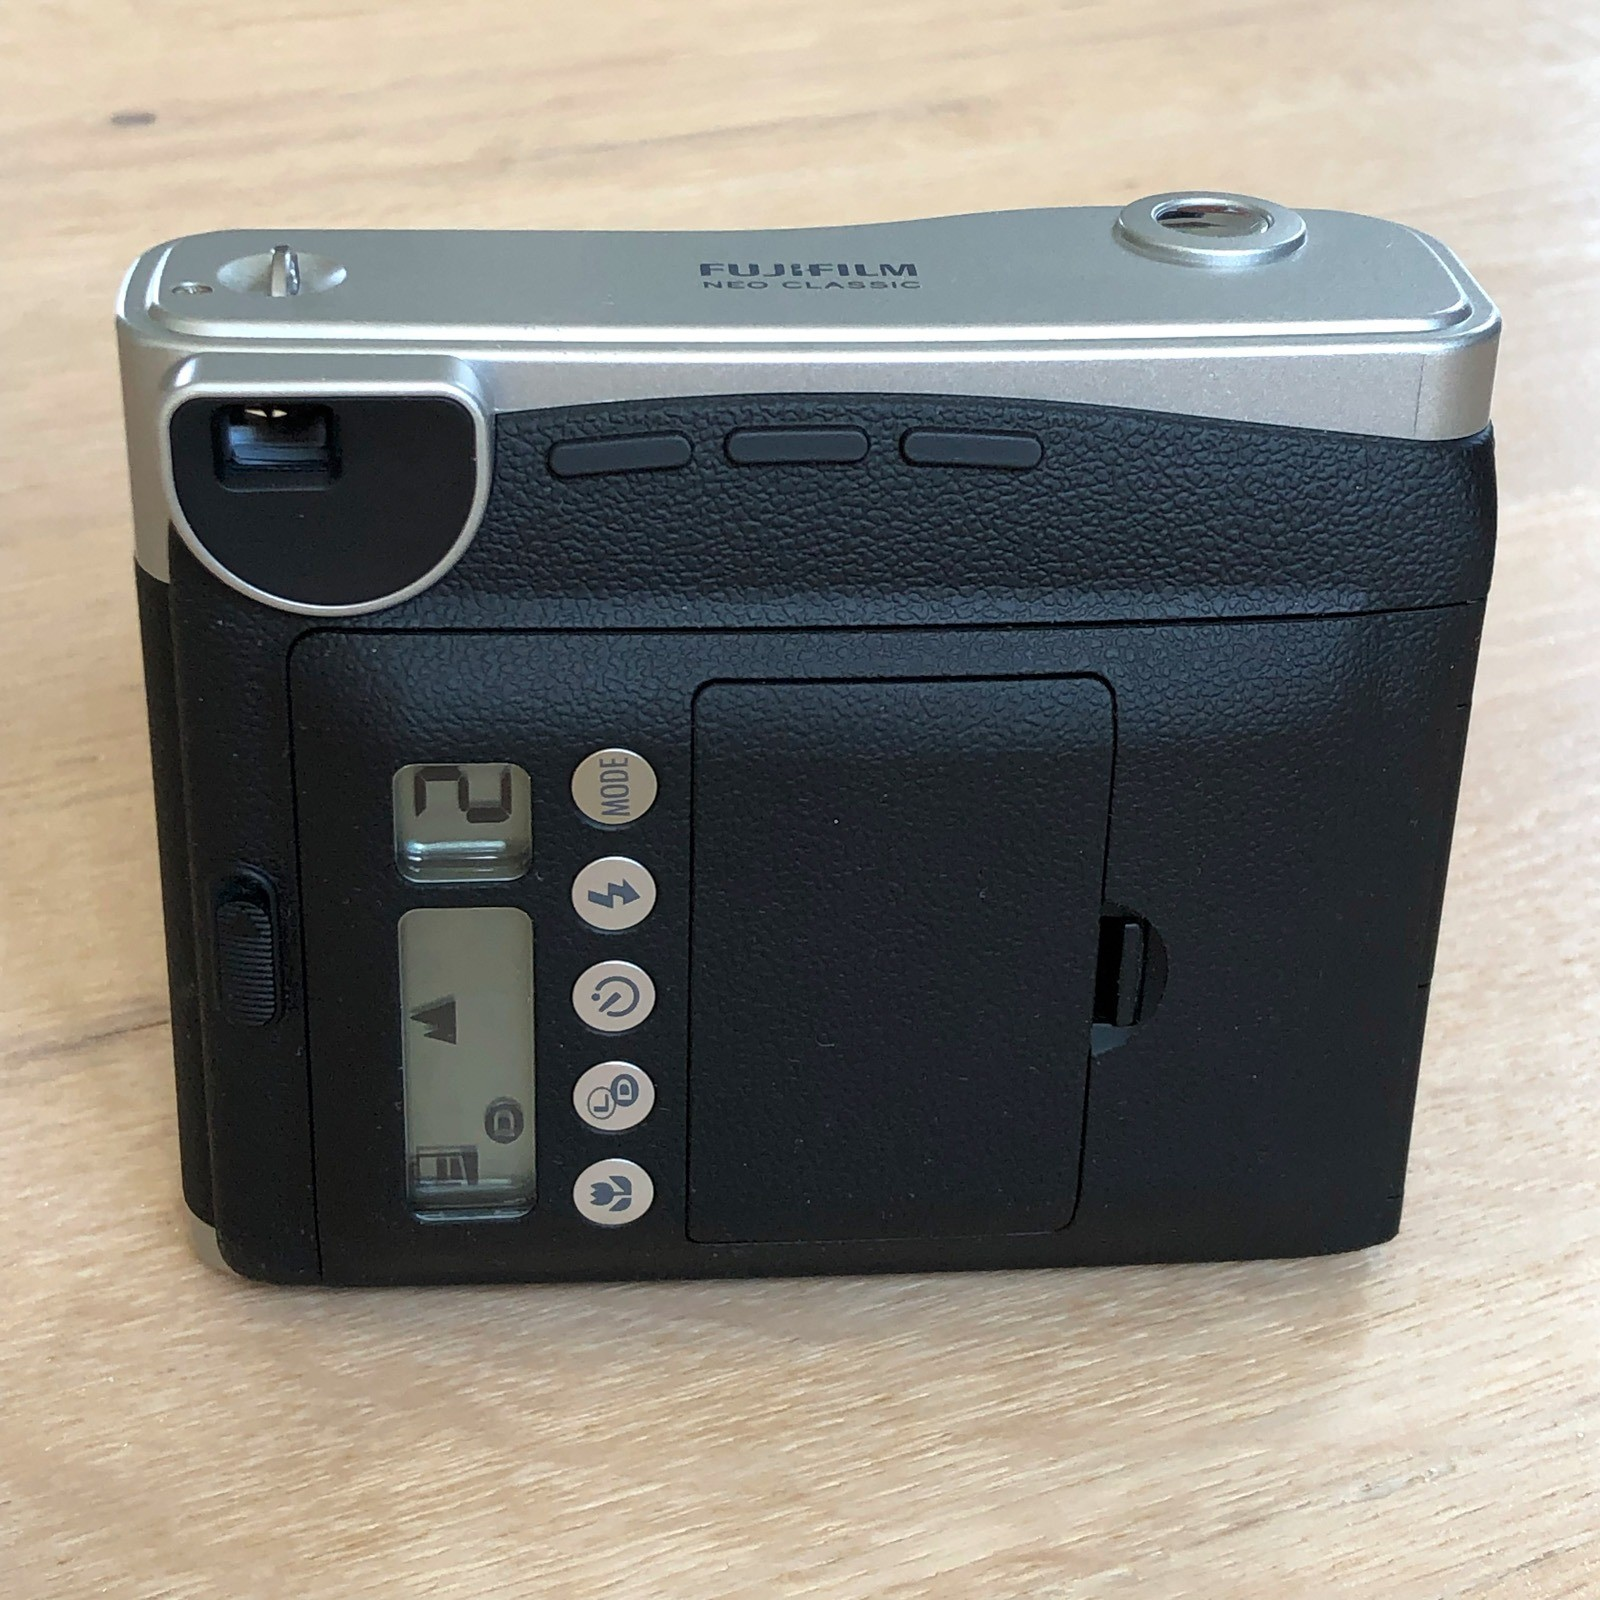 Fujifilm Instax Neo Classic Mini 90 - bagsiden